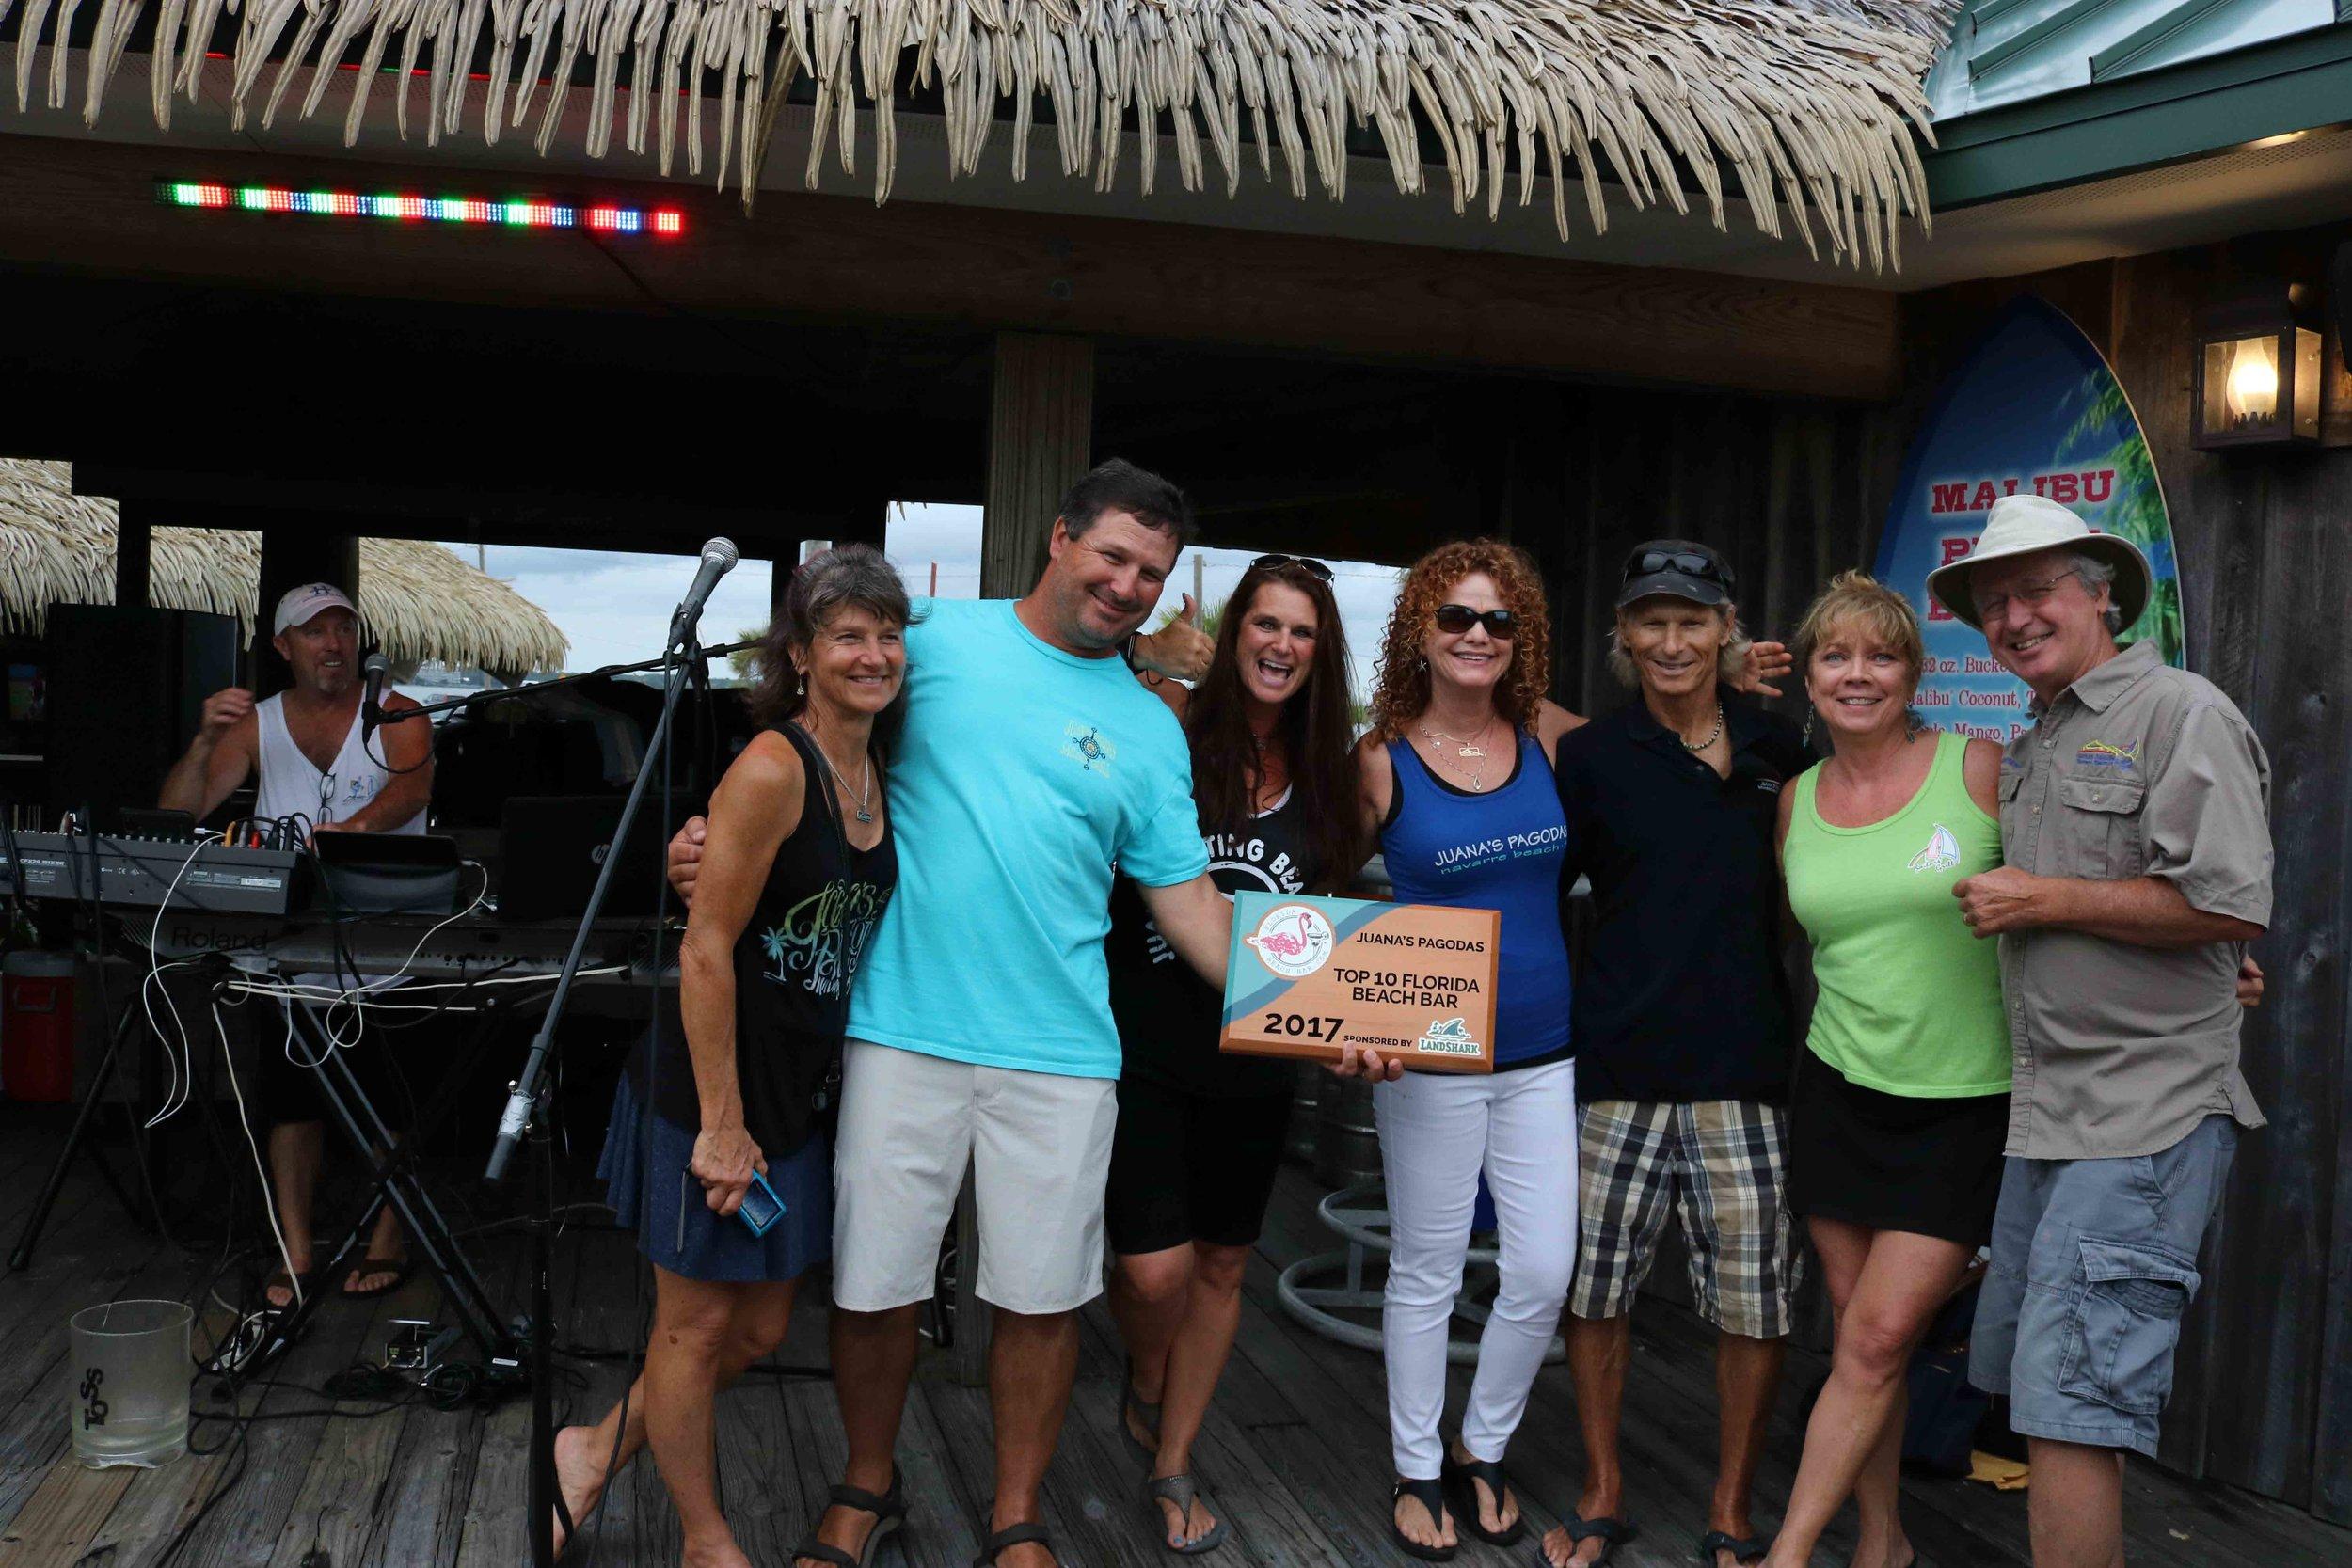 Kevin and his family accept the 2017 Top 10 Florida Beach Bar award